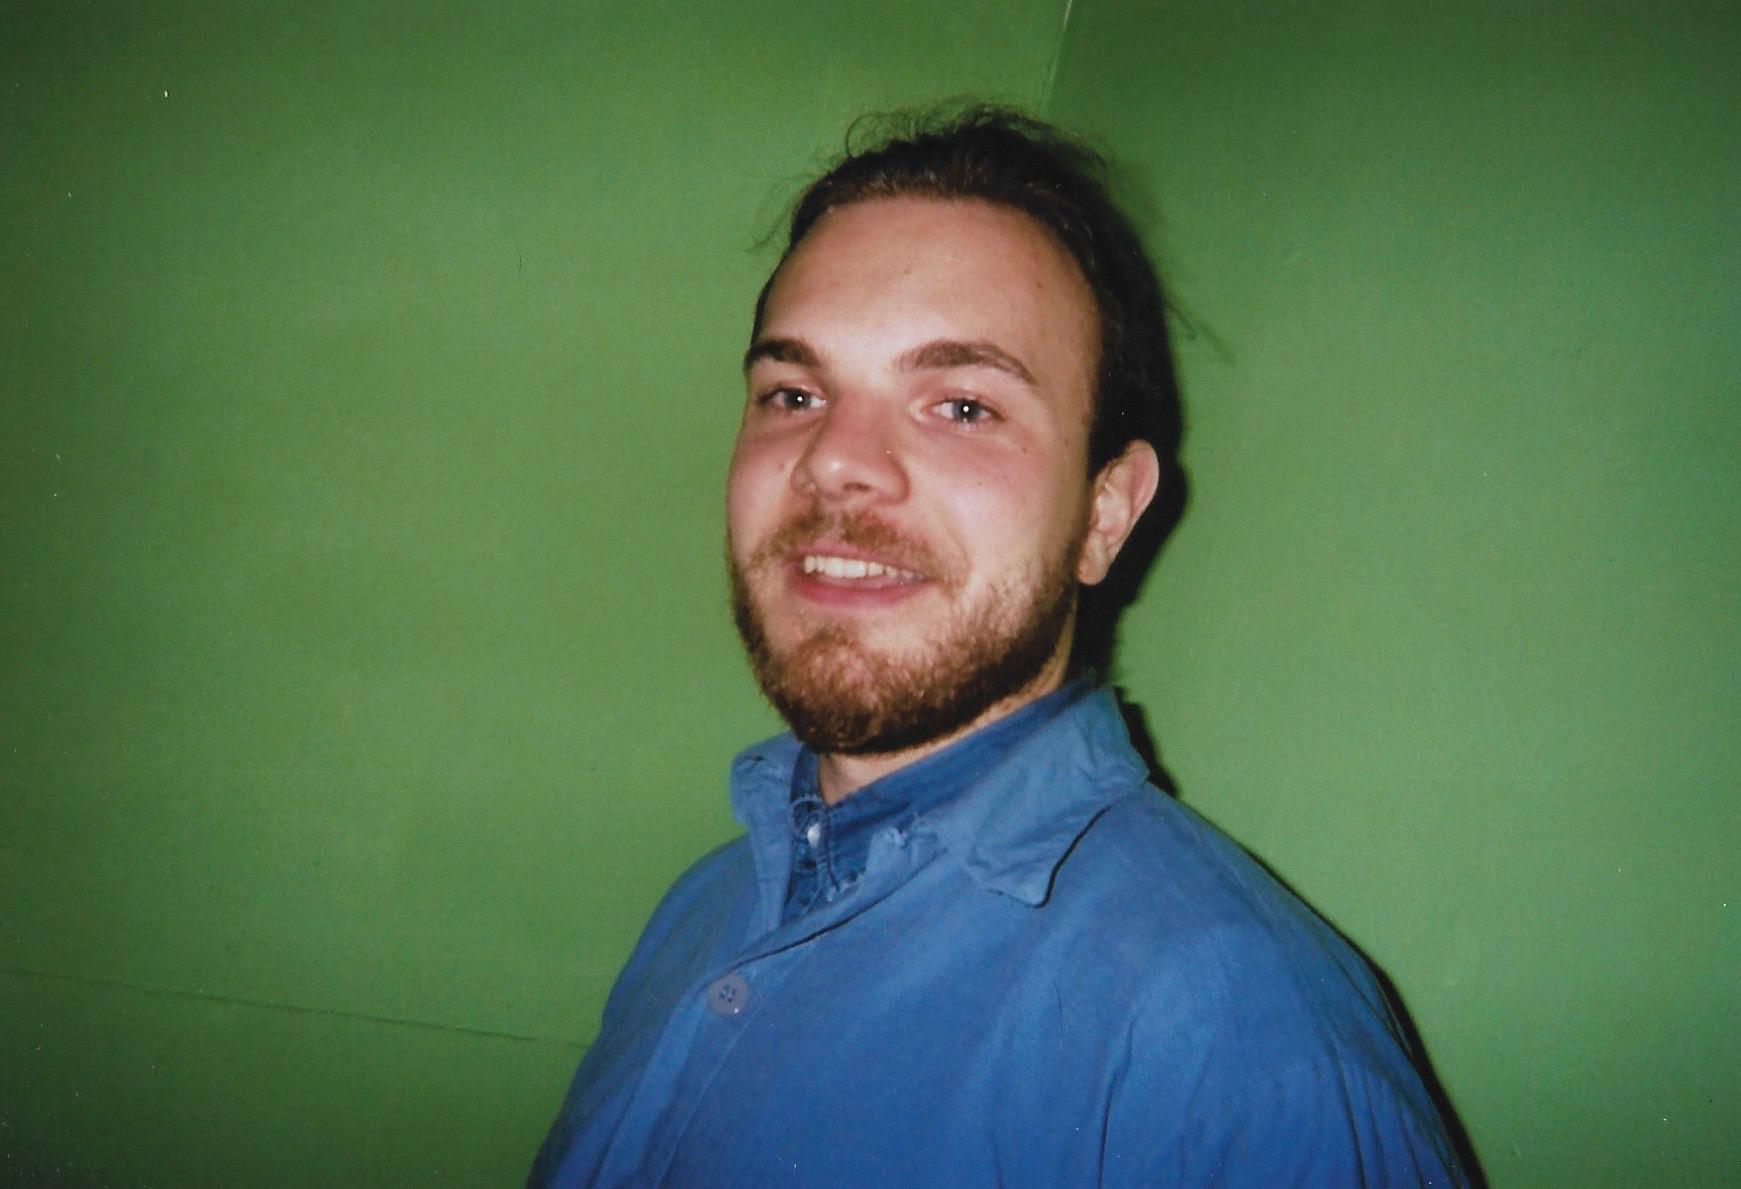 ChristopherUrsini_Photobooth9.jpg